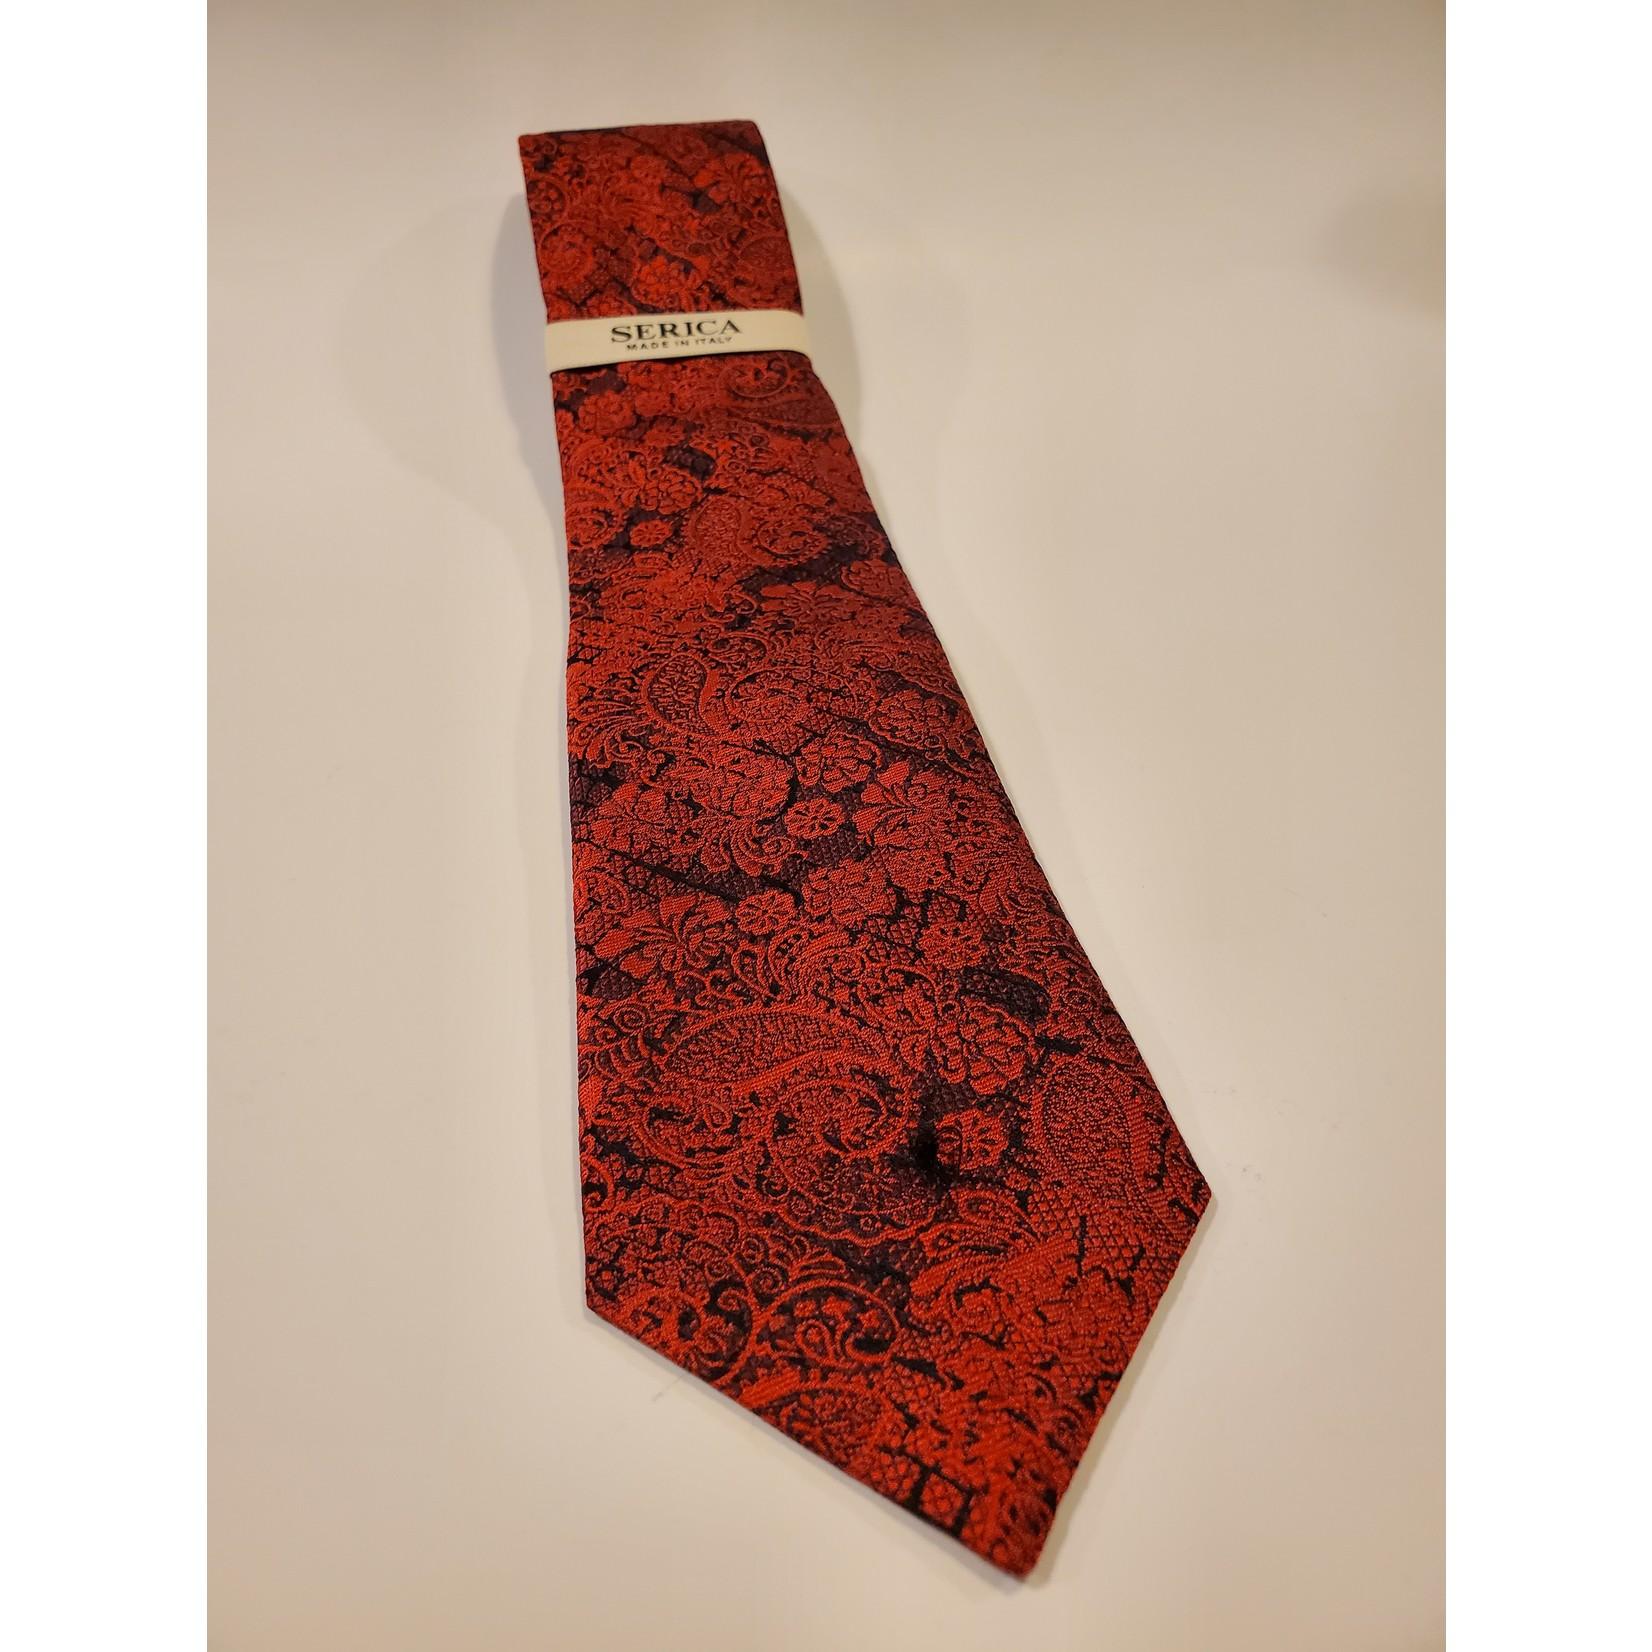 Serica 203230 Jacquard Silk Tie C - Red Floral